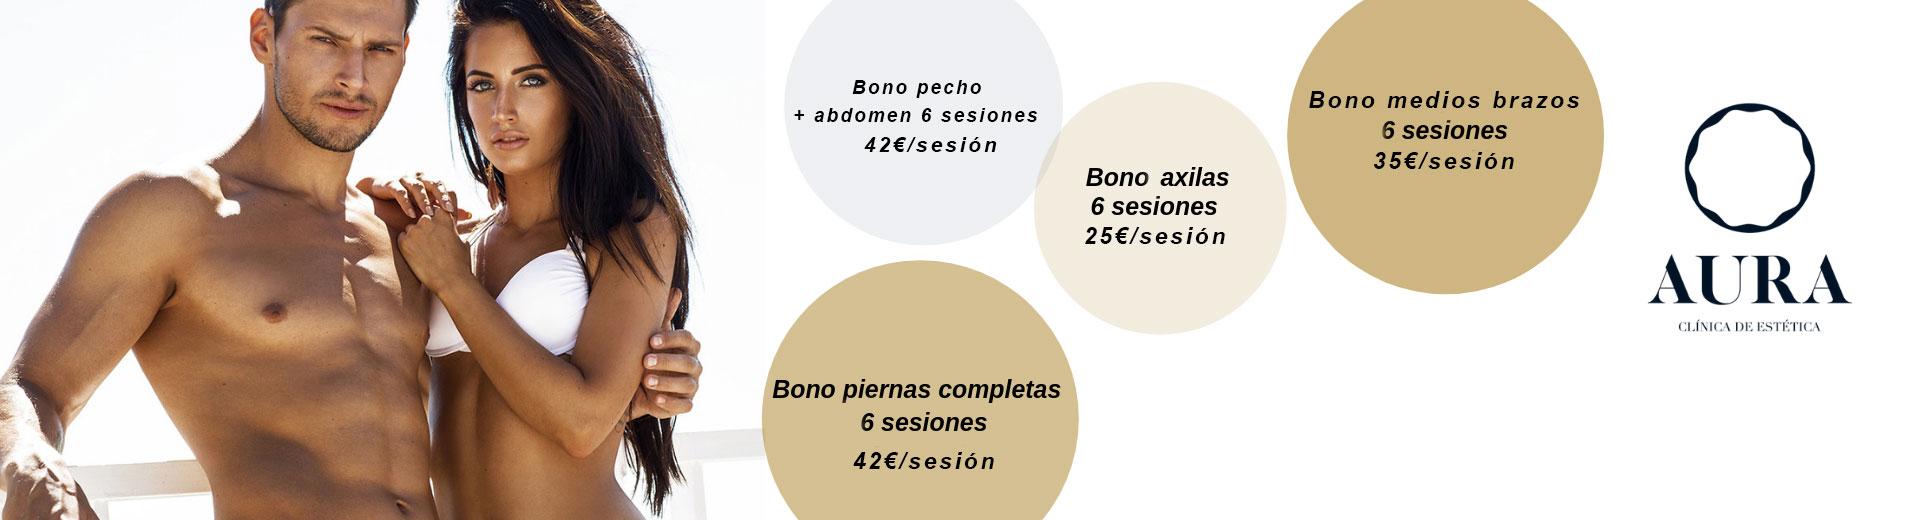 depilacionweb-2020-1